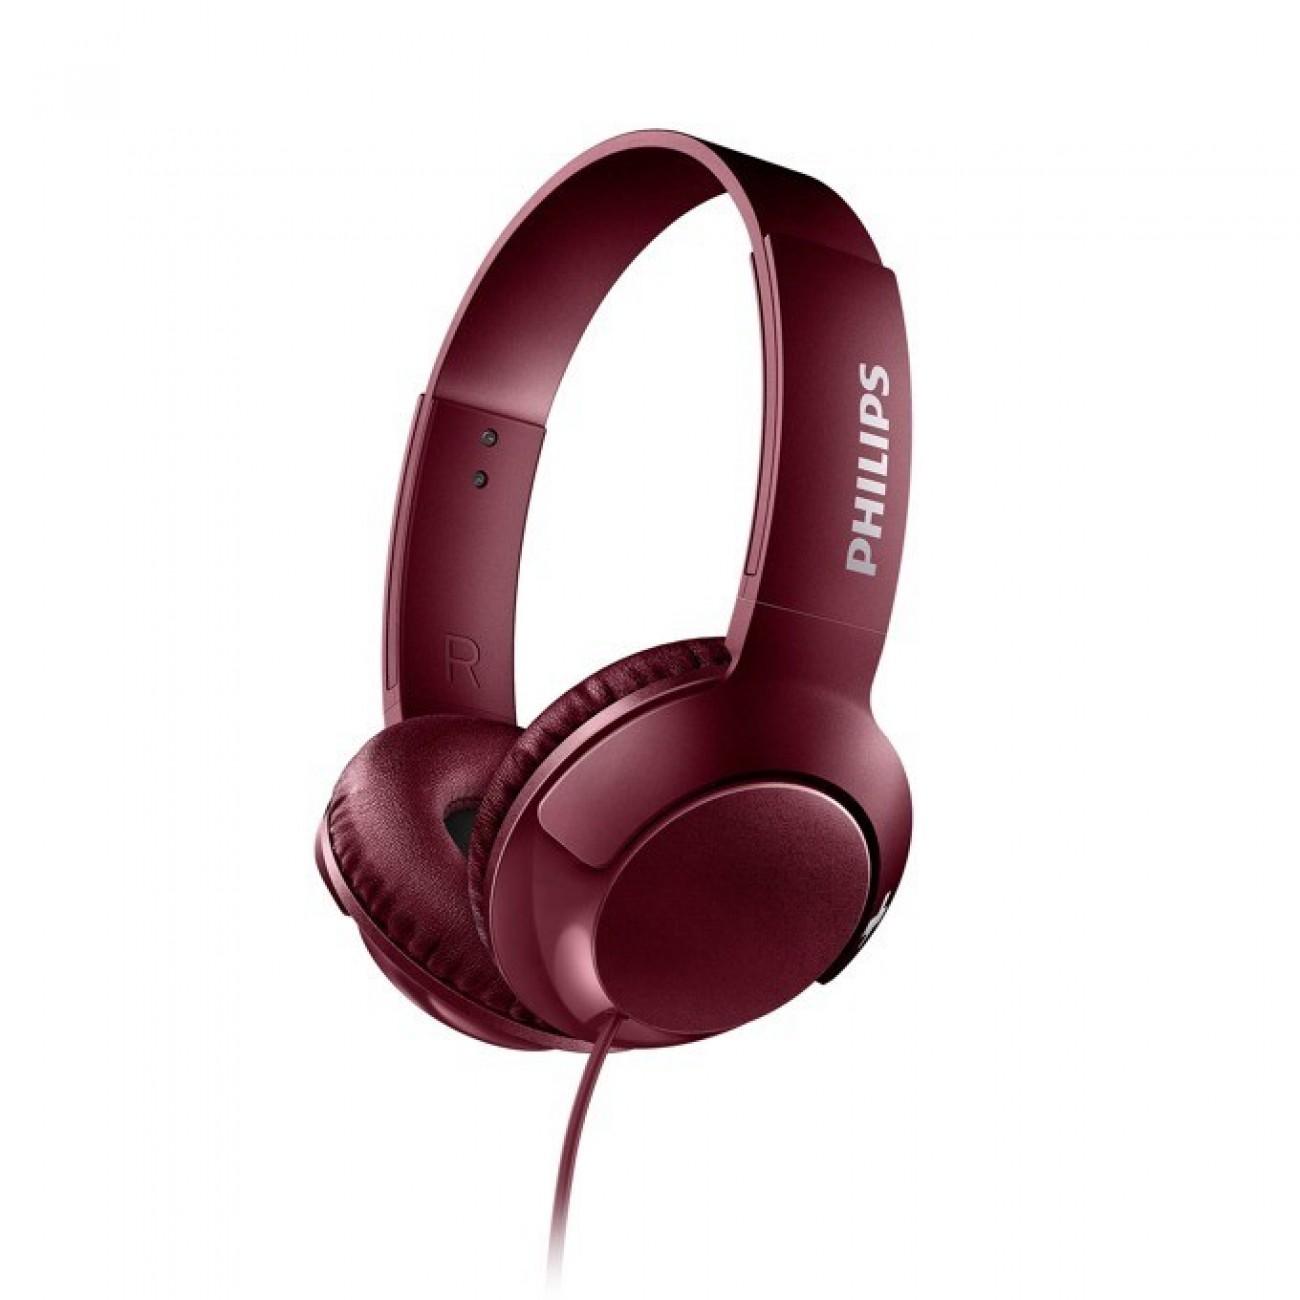 Слушалки Philips SHL3070RD, микрофон, честотен диапазон 9  23 000 Hz, червени в Слушалки -  | Alleop